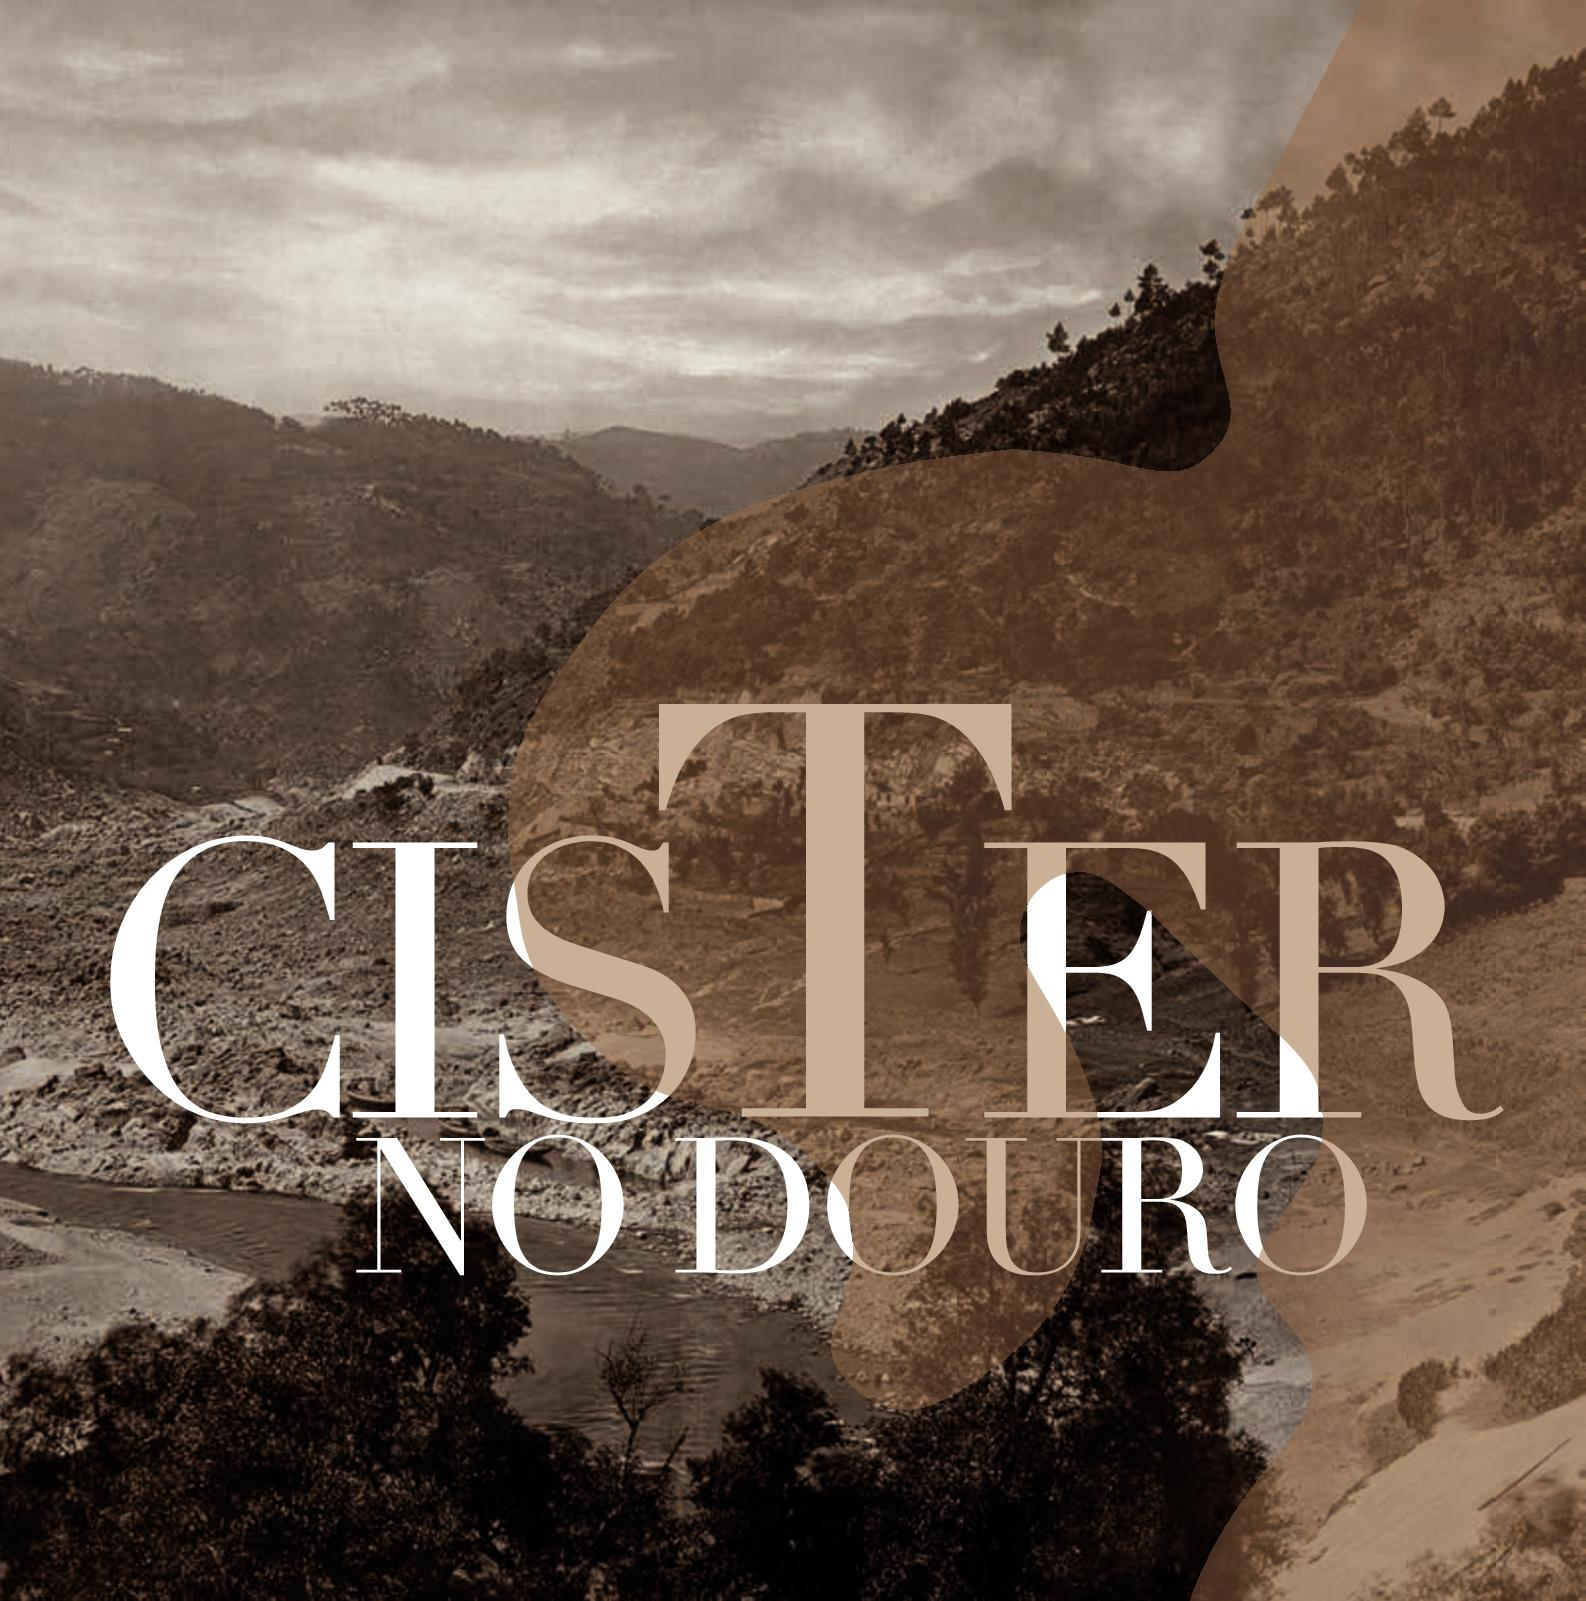 Calamo cister no douro fandeluxe Image collections